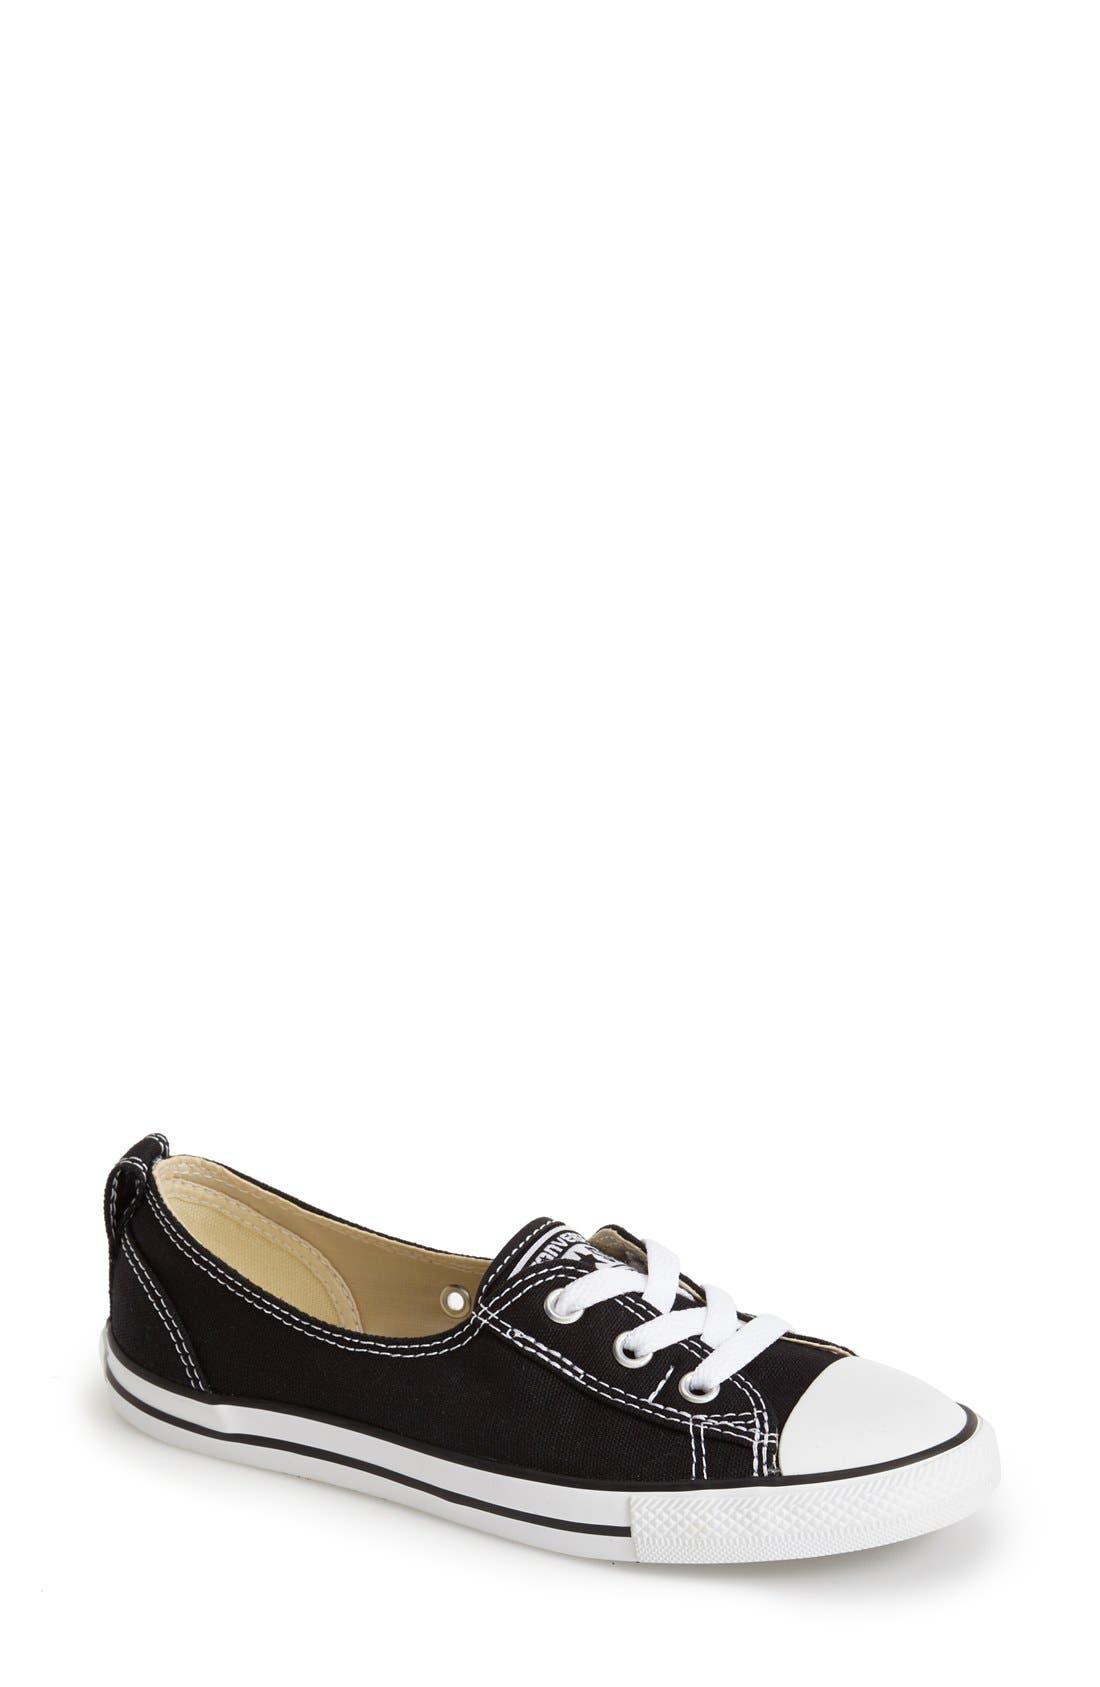 Main Image - Converse Chuck Taylor® All Star® Ballet Canvas Sneaker (Women)